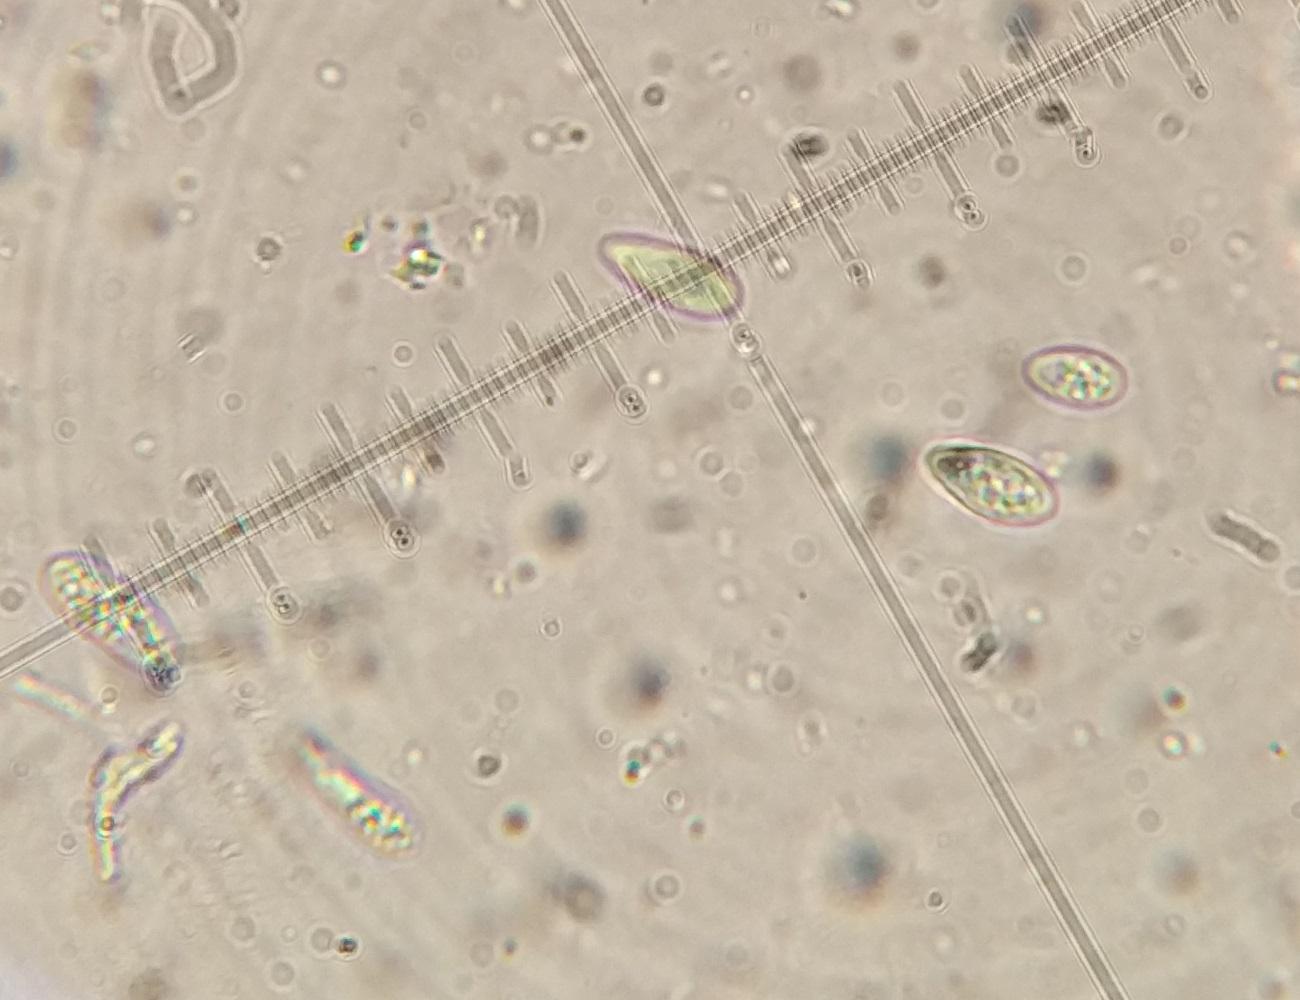 IMG_20210216_142631 Bryobilimbia sanguineoatra 1000x oil